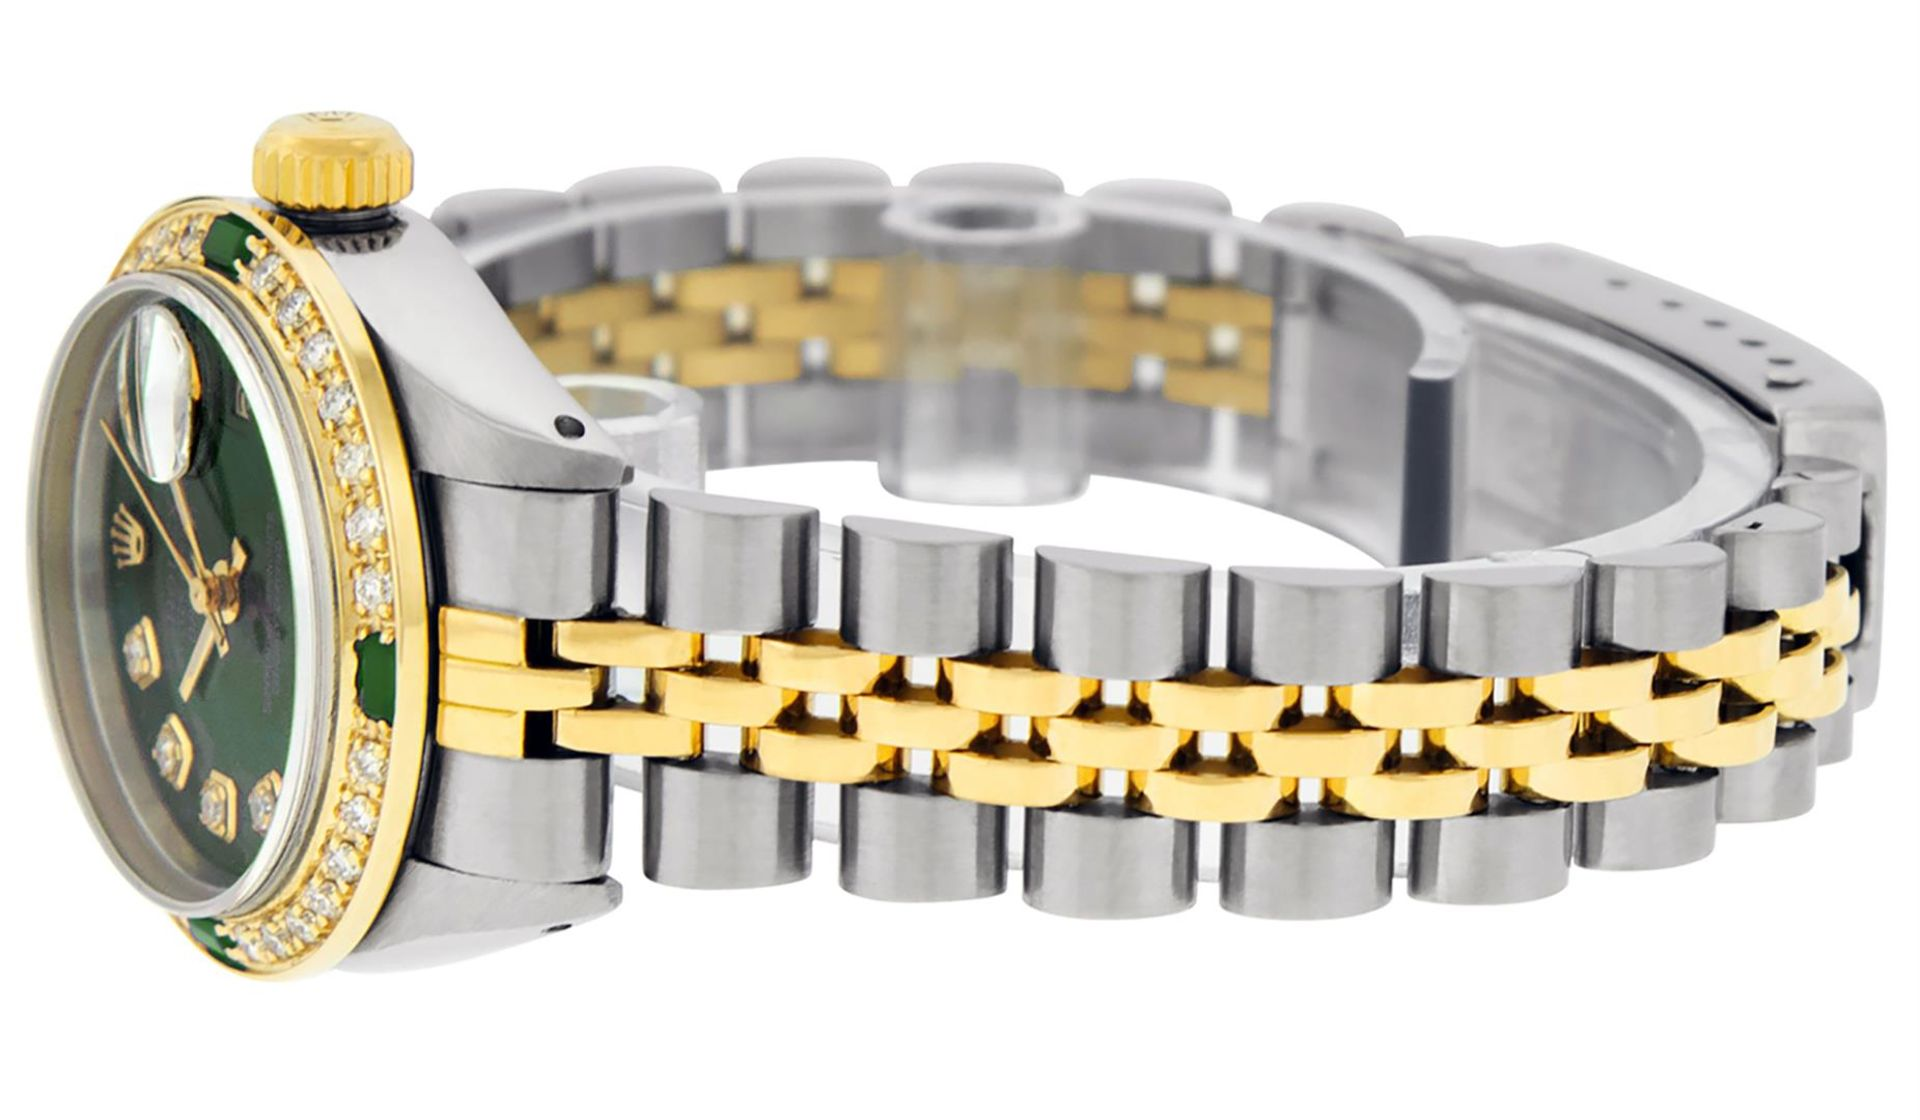 Rolex Ladies 2 Tone Green Diamond & Emerald Datejust Wristwatch - Image 9 of 9